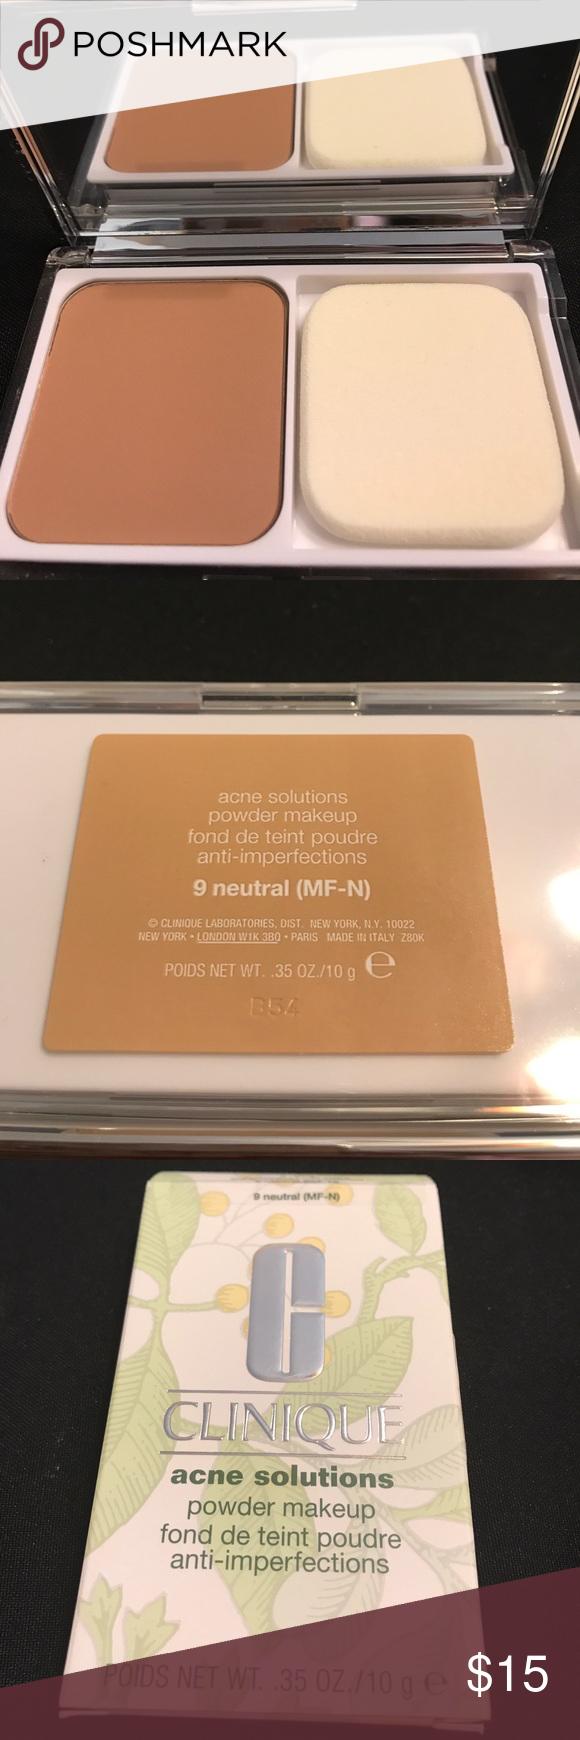 Clinique 9 Acne Solutions Powder. New neutral(MFN